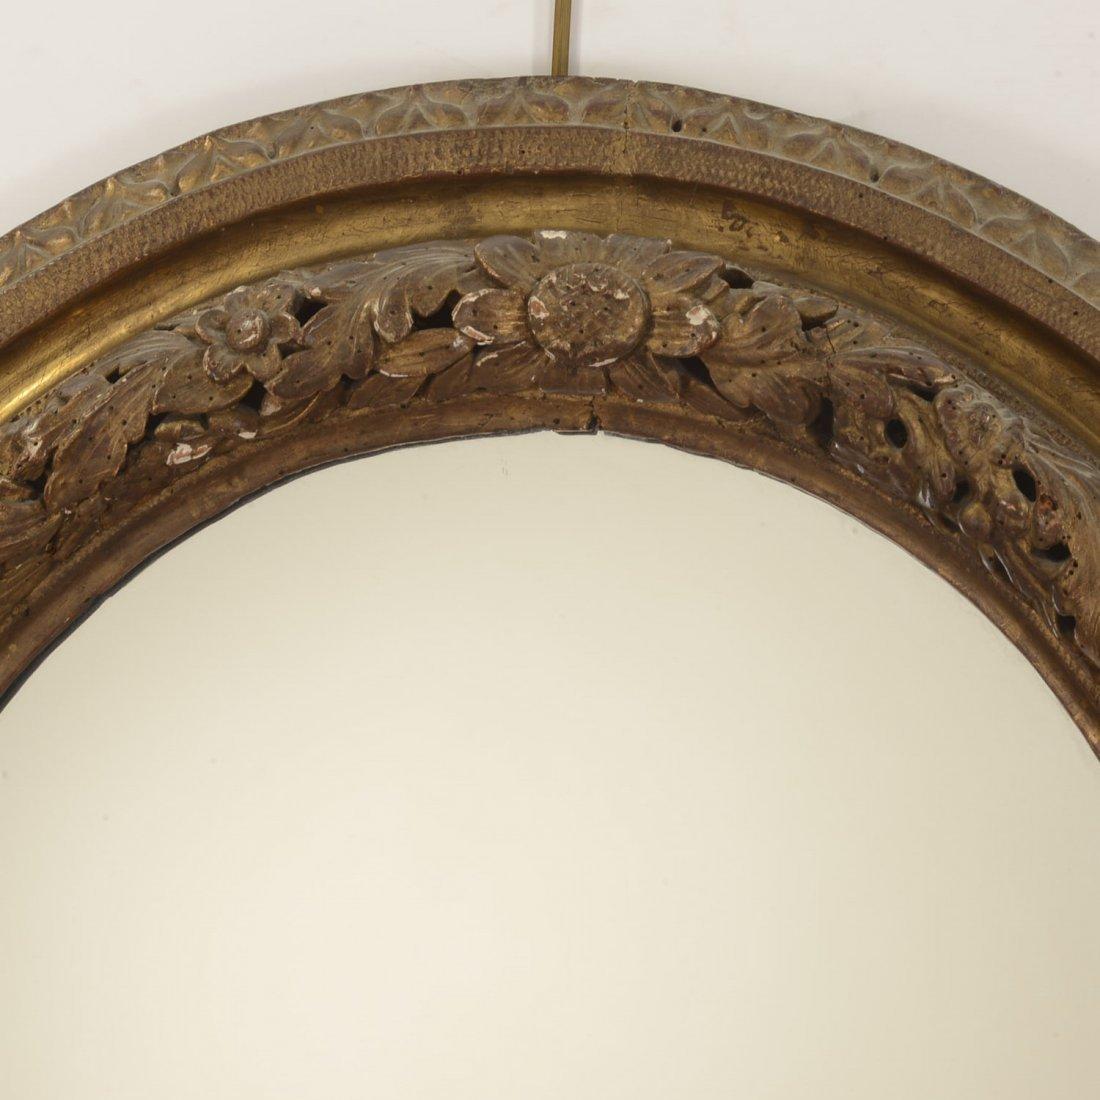 Continental Rococo giltwood oval wall mirror - 2